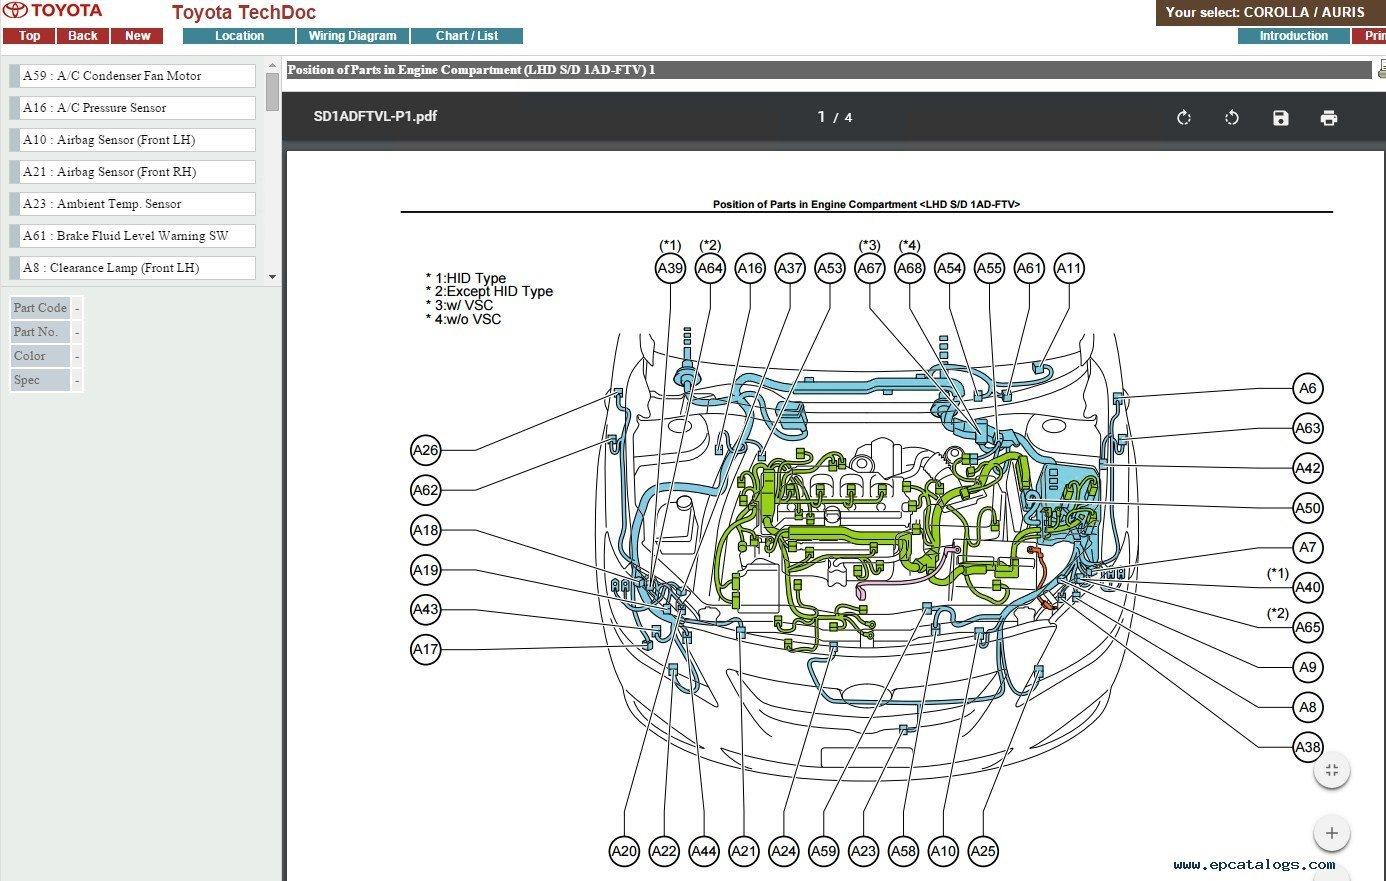 toyota auris wiring diagram 2000 buick lesabre corolla pdf manual